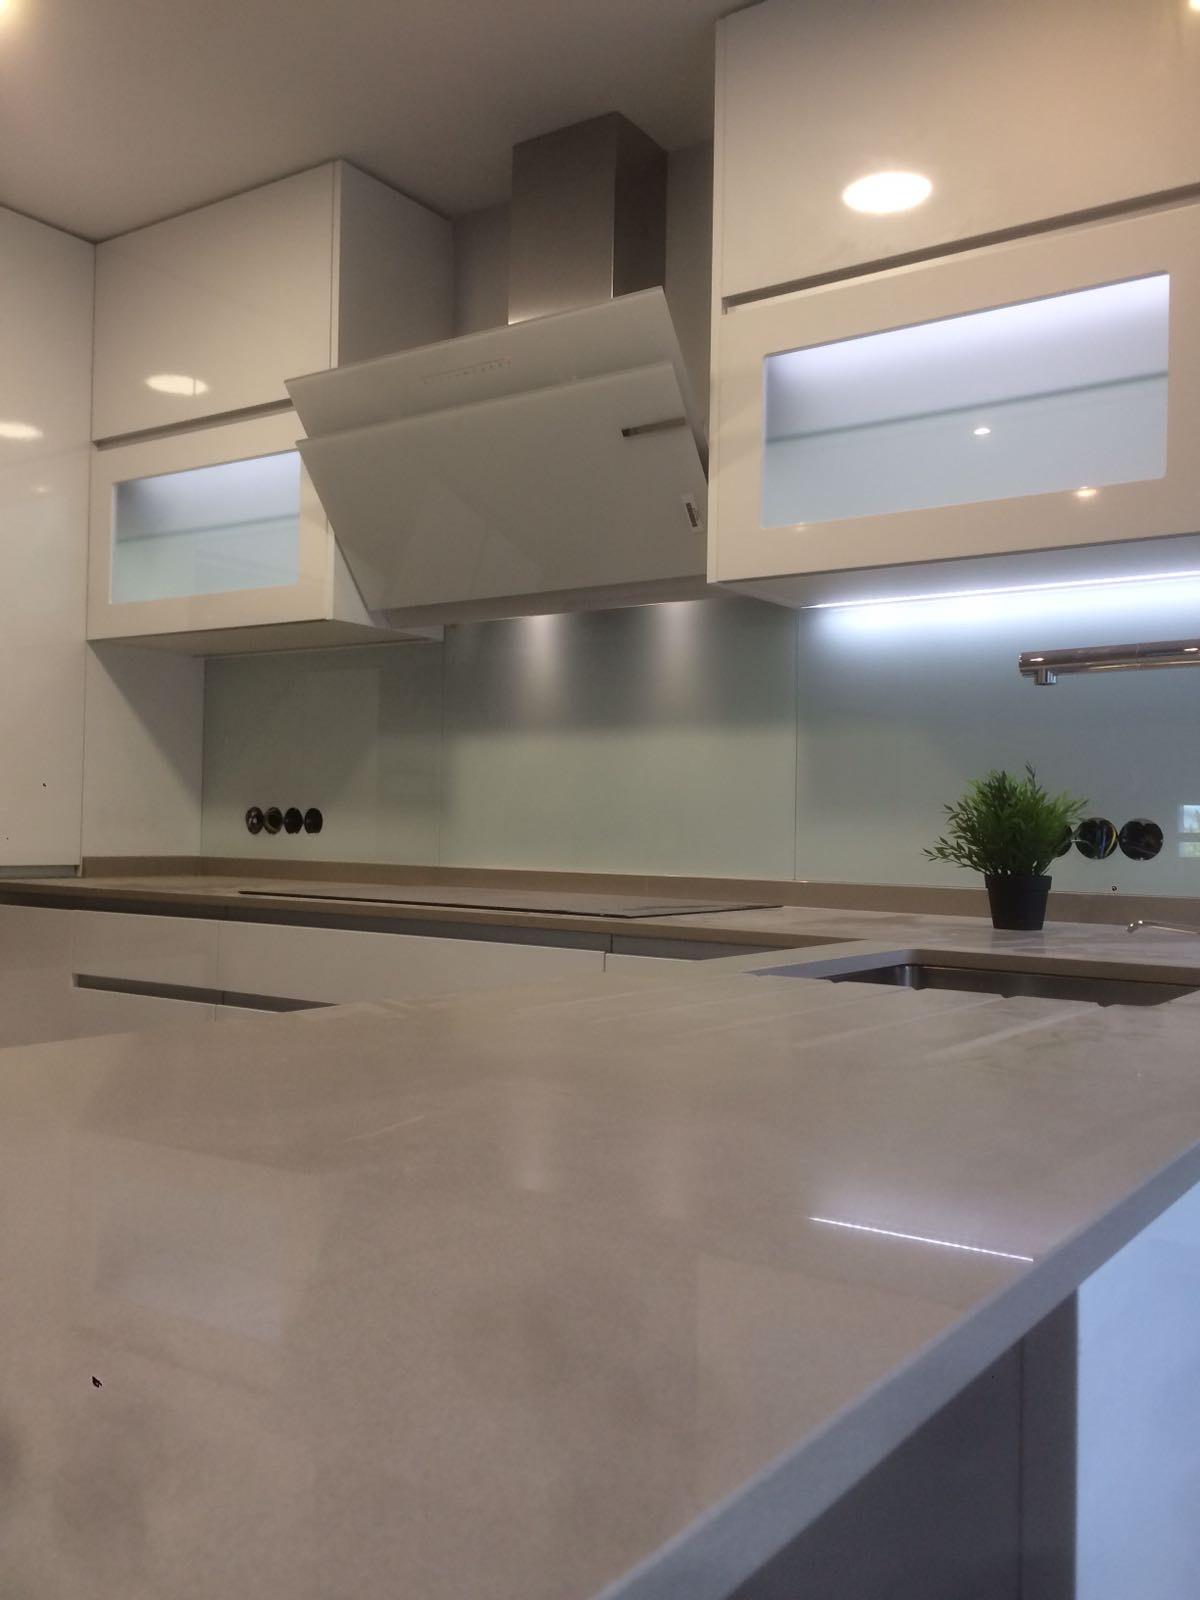 Luces Led Para Cocina | Led Bajo Mueble Cocina Parlat Led Lmpara Bajo Mueble Rigel Cm Lm